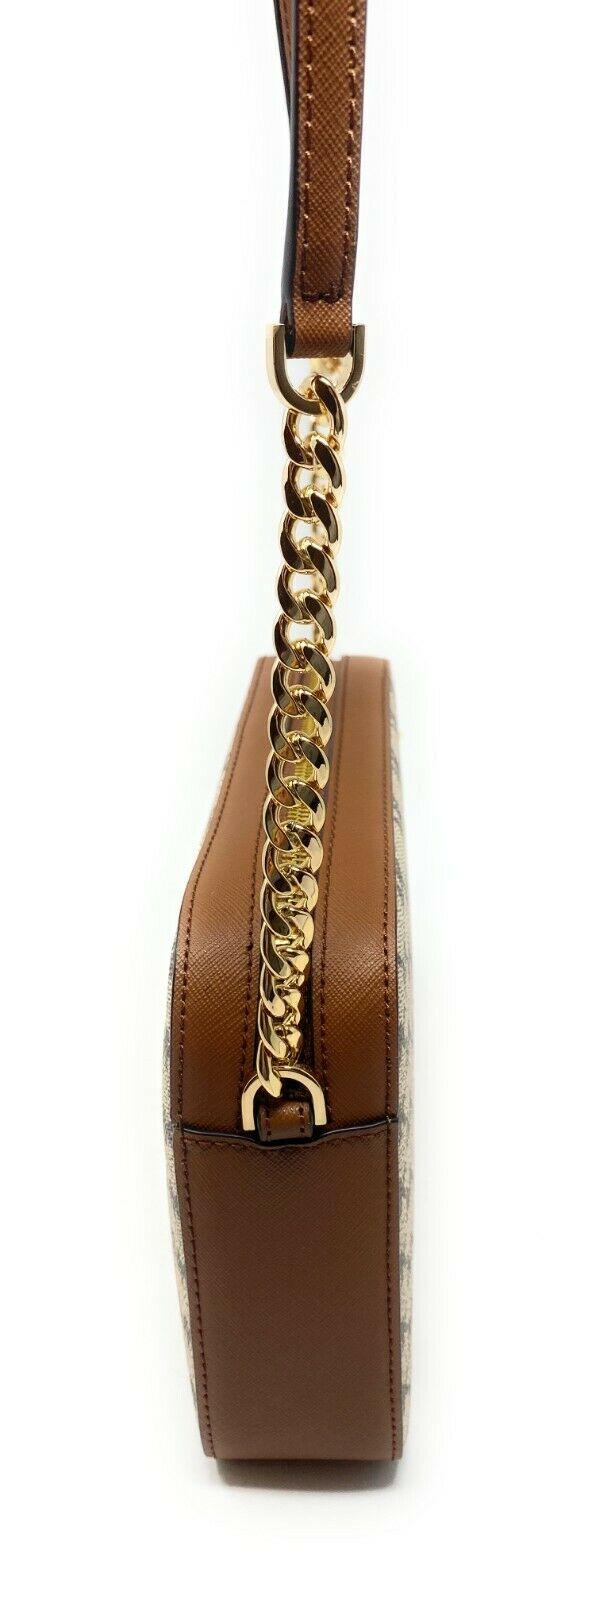 thumbnail 70 - Michael Kors Jet Set Item Large East West Crossbody Chain Handbag Clutch $298